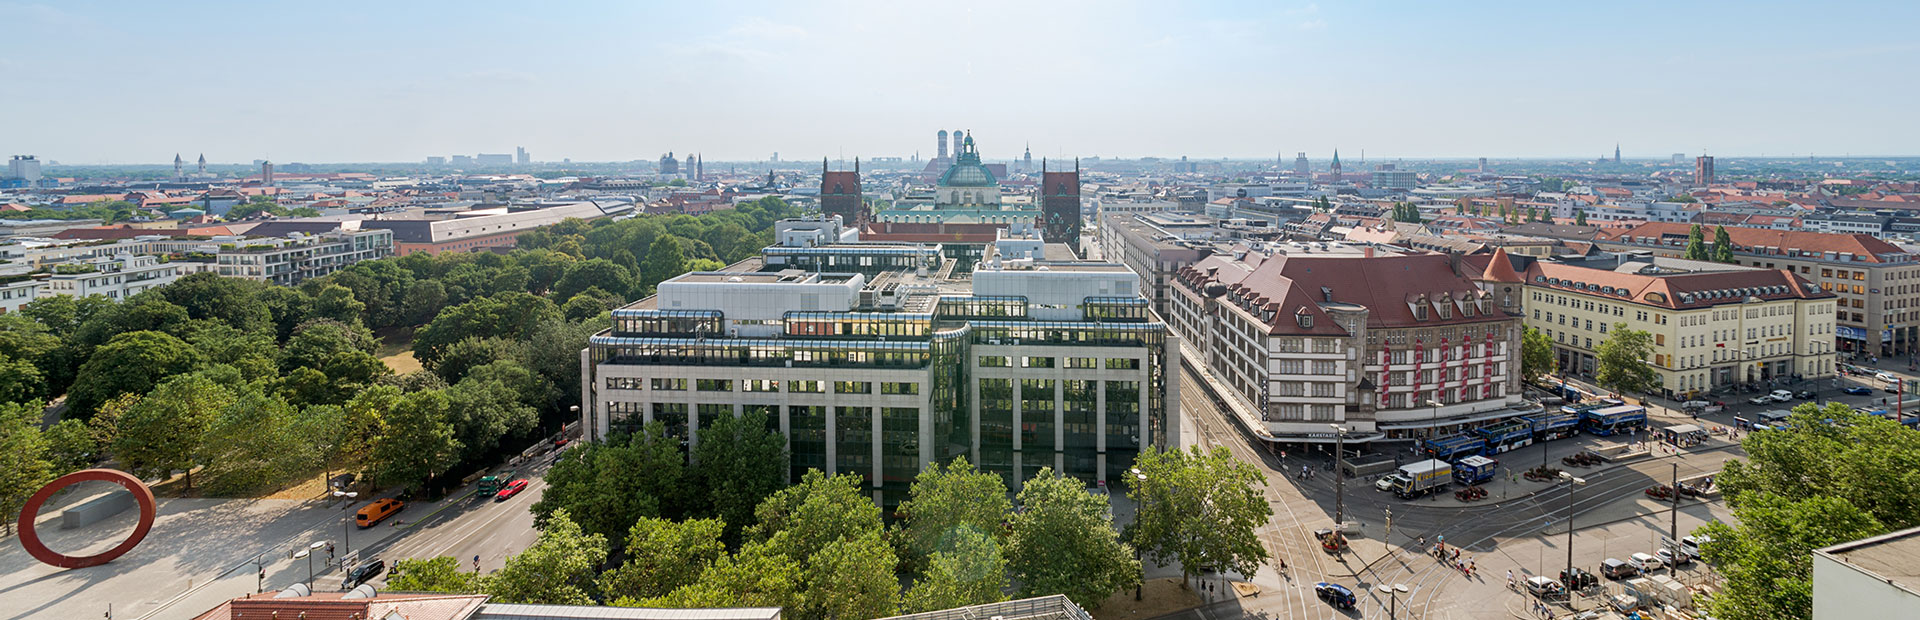 V_NH_munchen-deutscher-kaiser_087_web